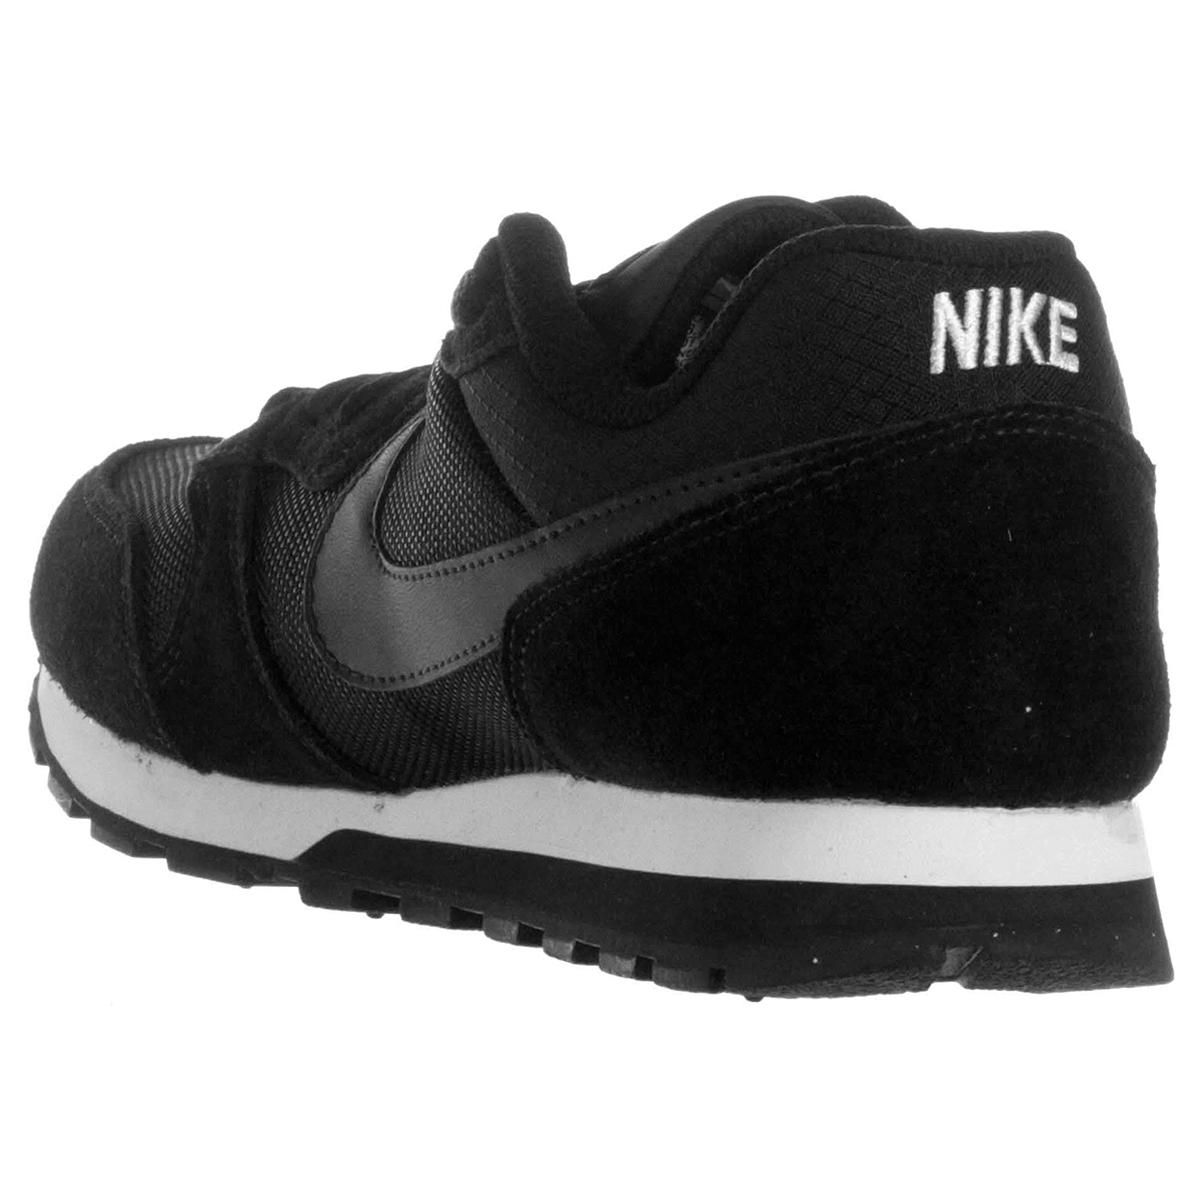 Tênis Feminino Nike Md Runner 2 - BRACIA SHOP  Loja de Roupas ... 2d611babb5a7d